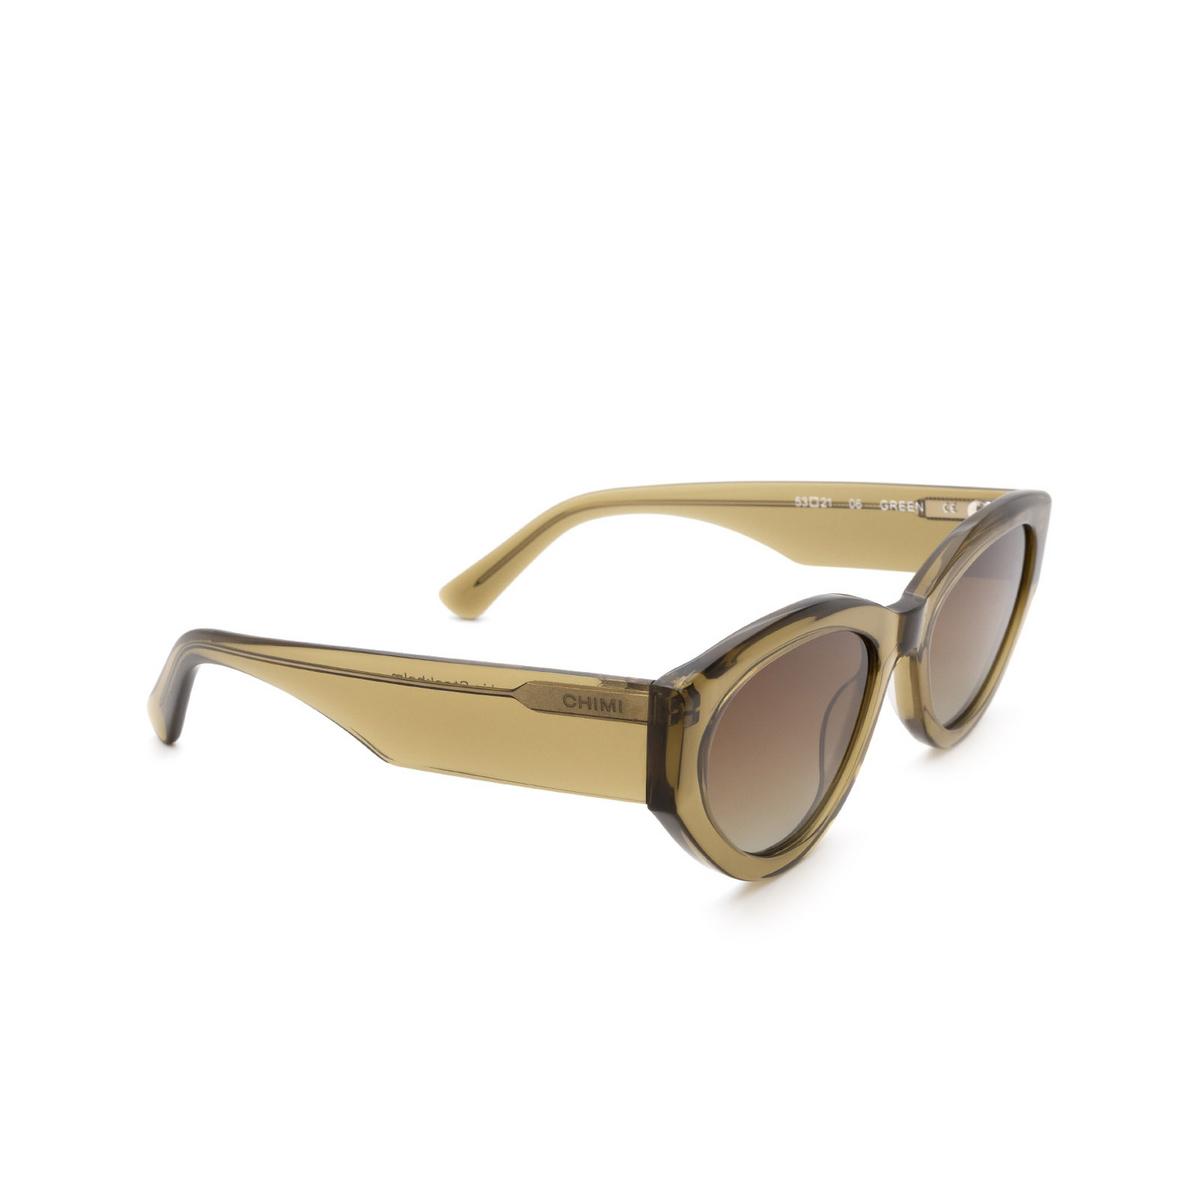 Chimi® Cat-eye Sunglasses: 06 color Green - three-quarters view.